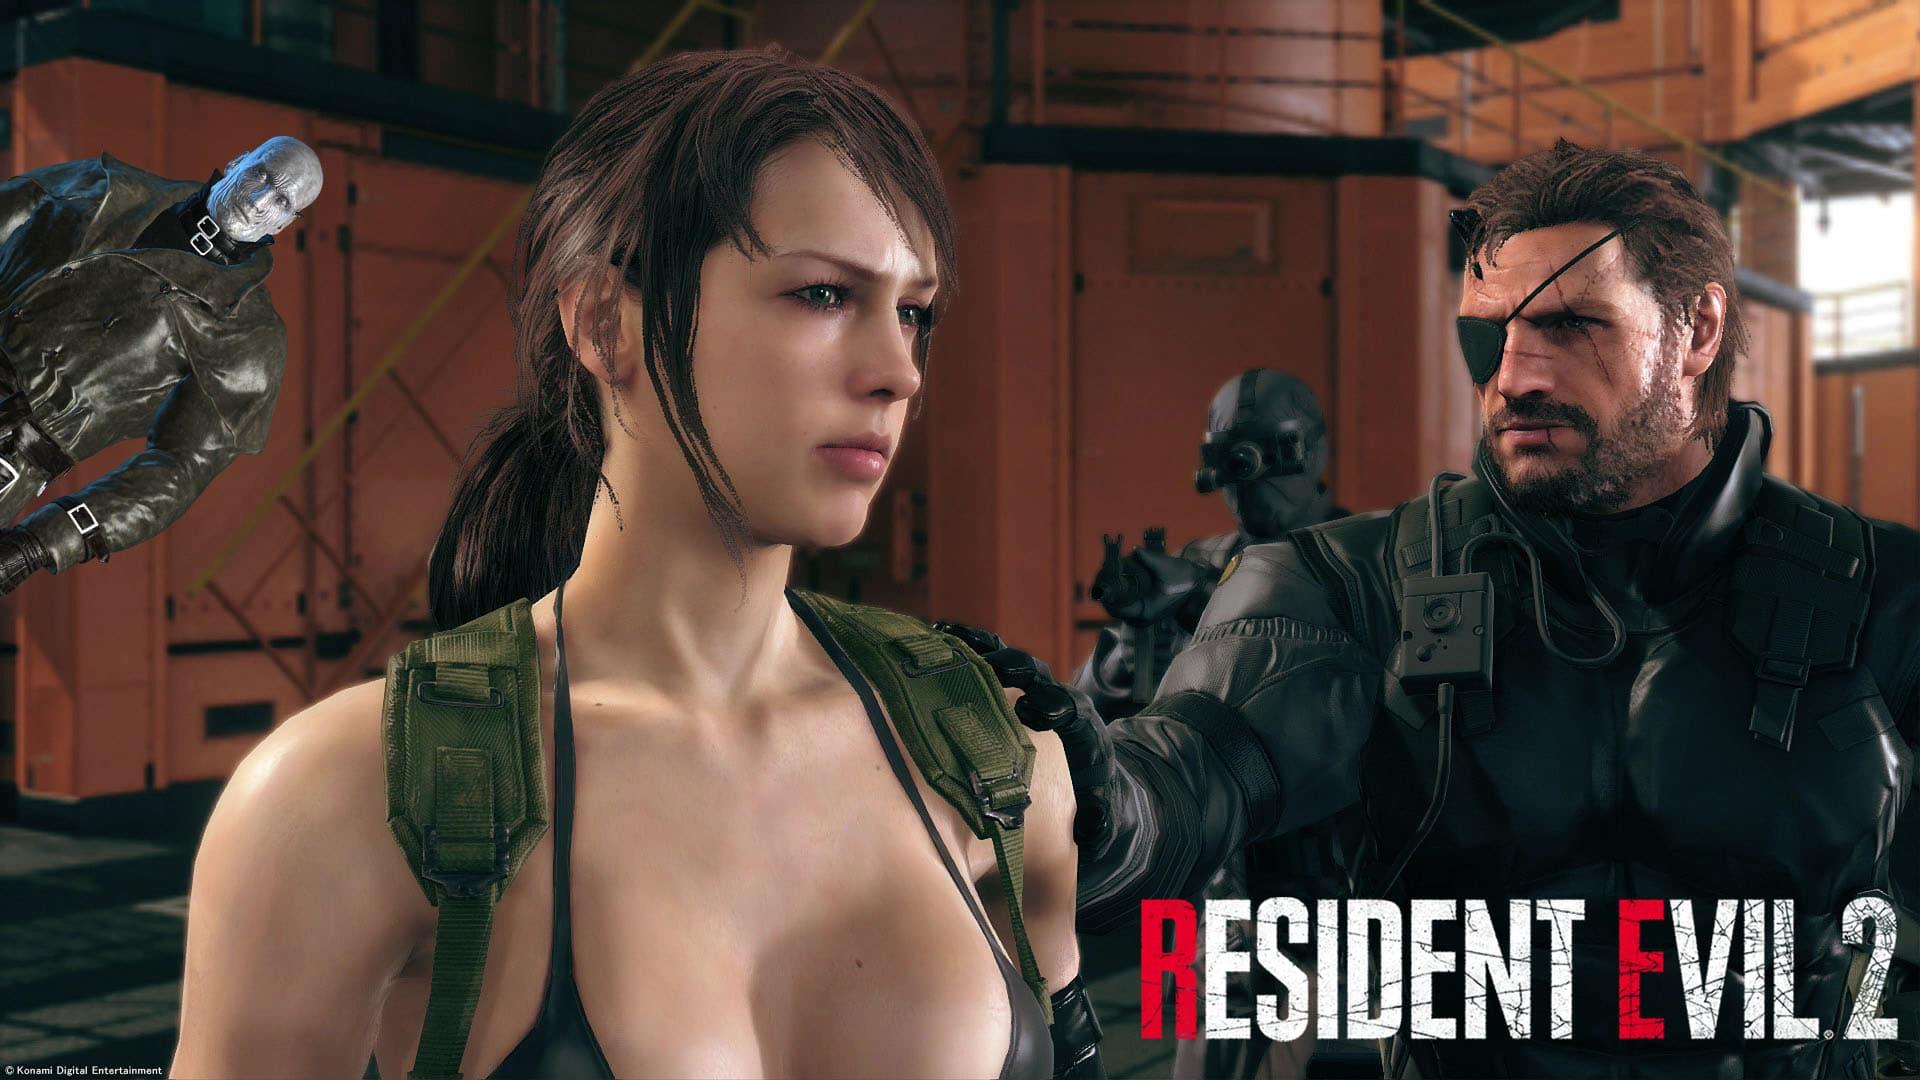 Un Nuevo Mod En Resident Evil 2 Reemplaza A Claire Leon